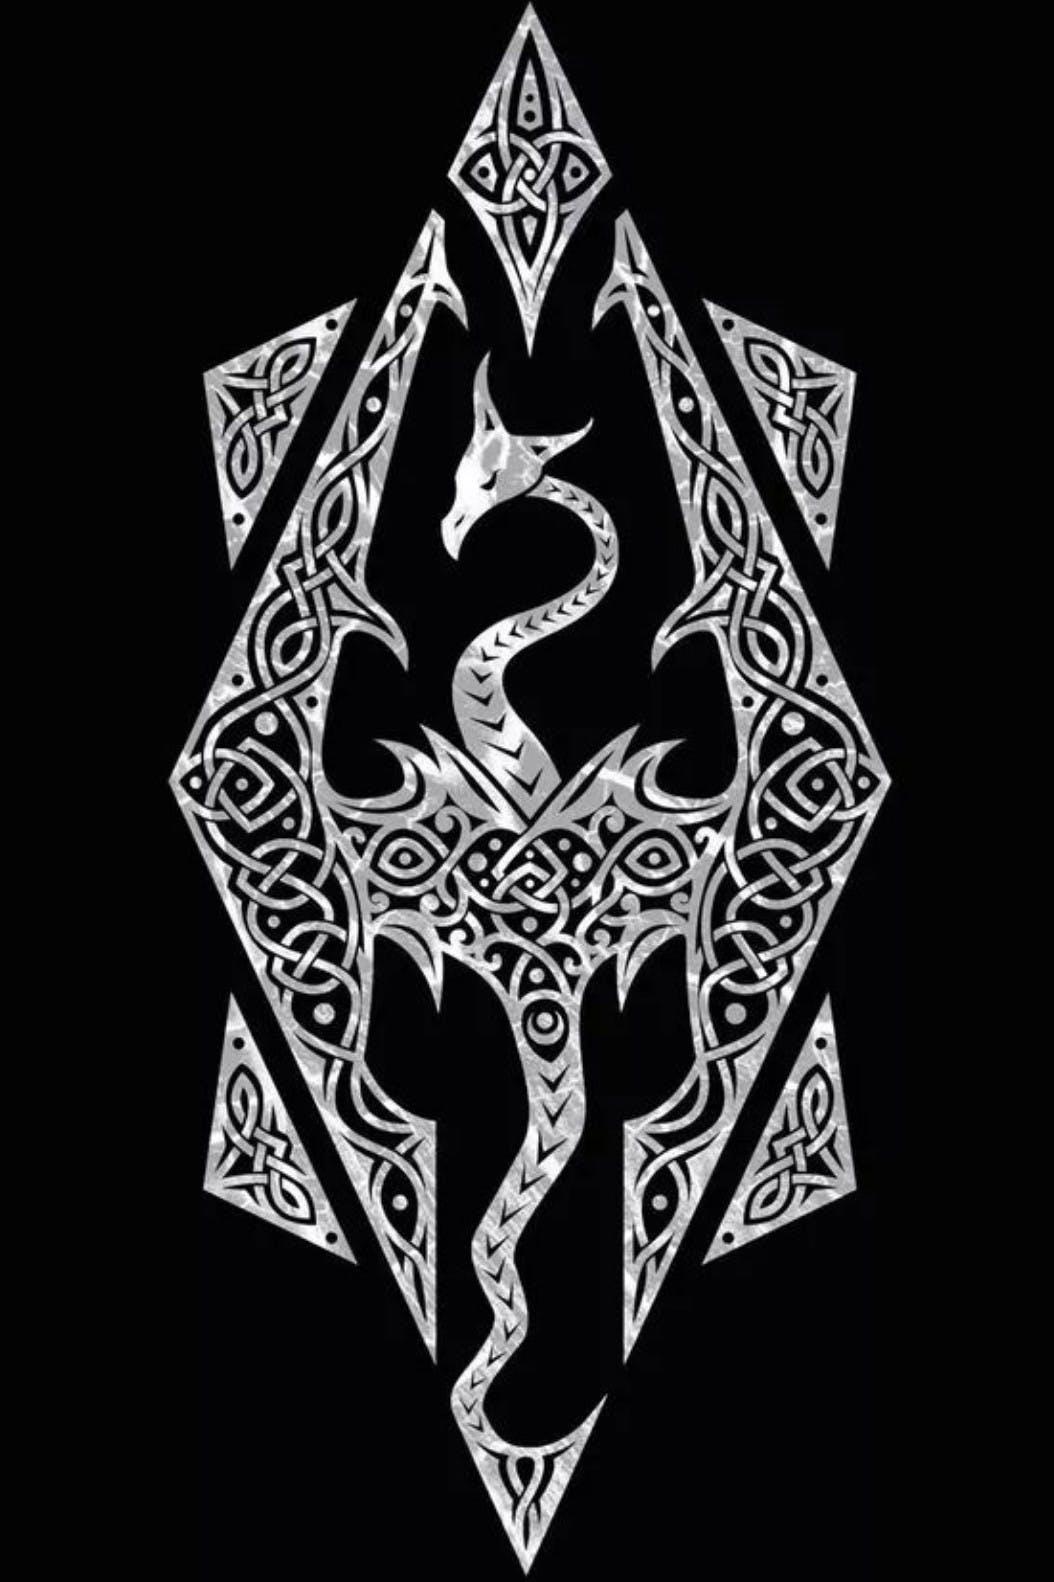 Tattoo uploaded by Jason Roulston.